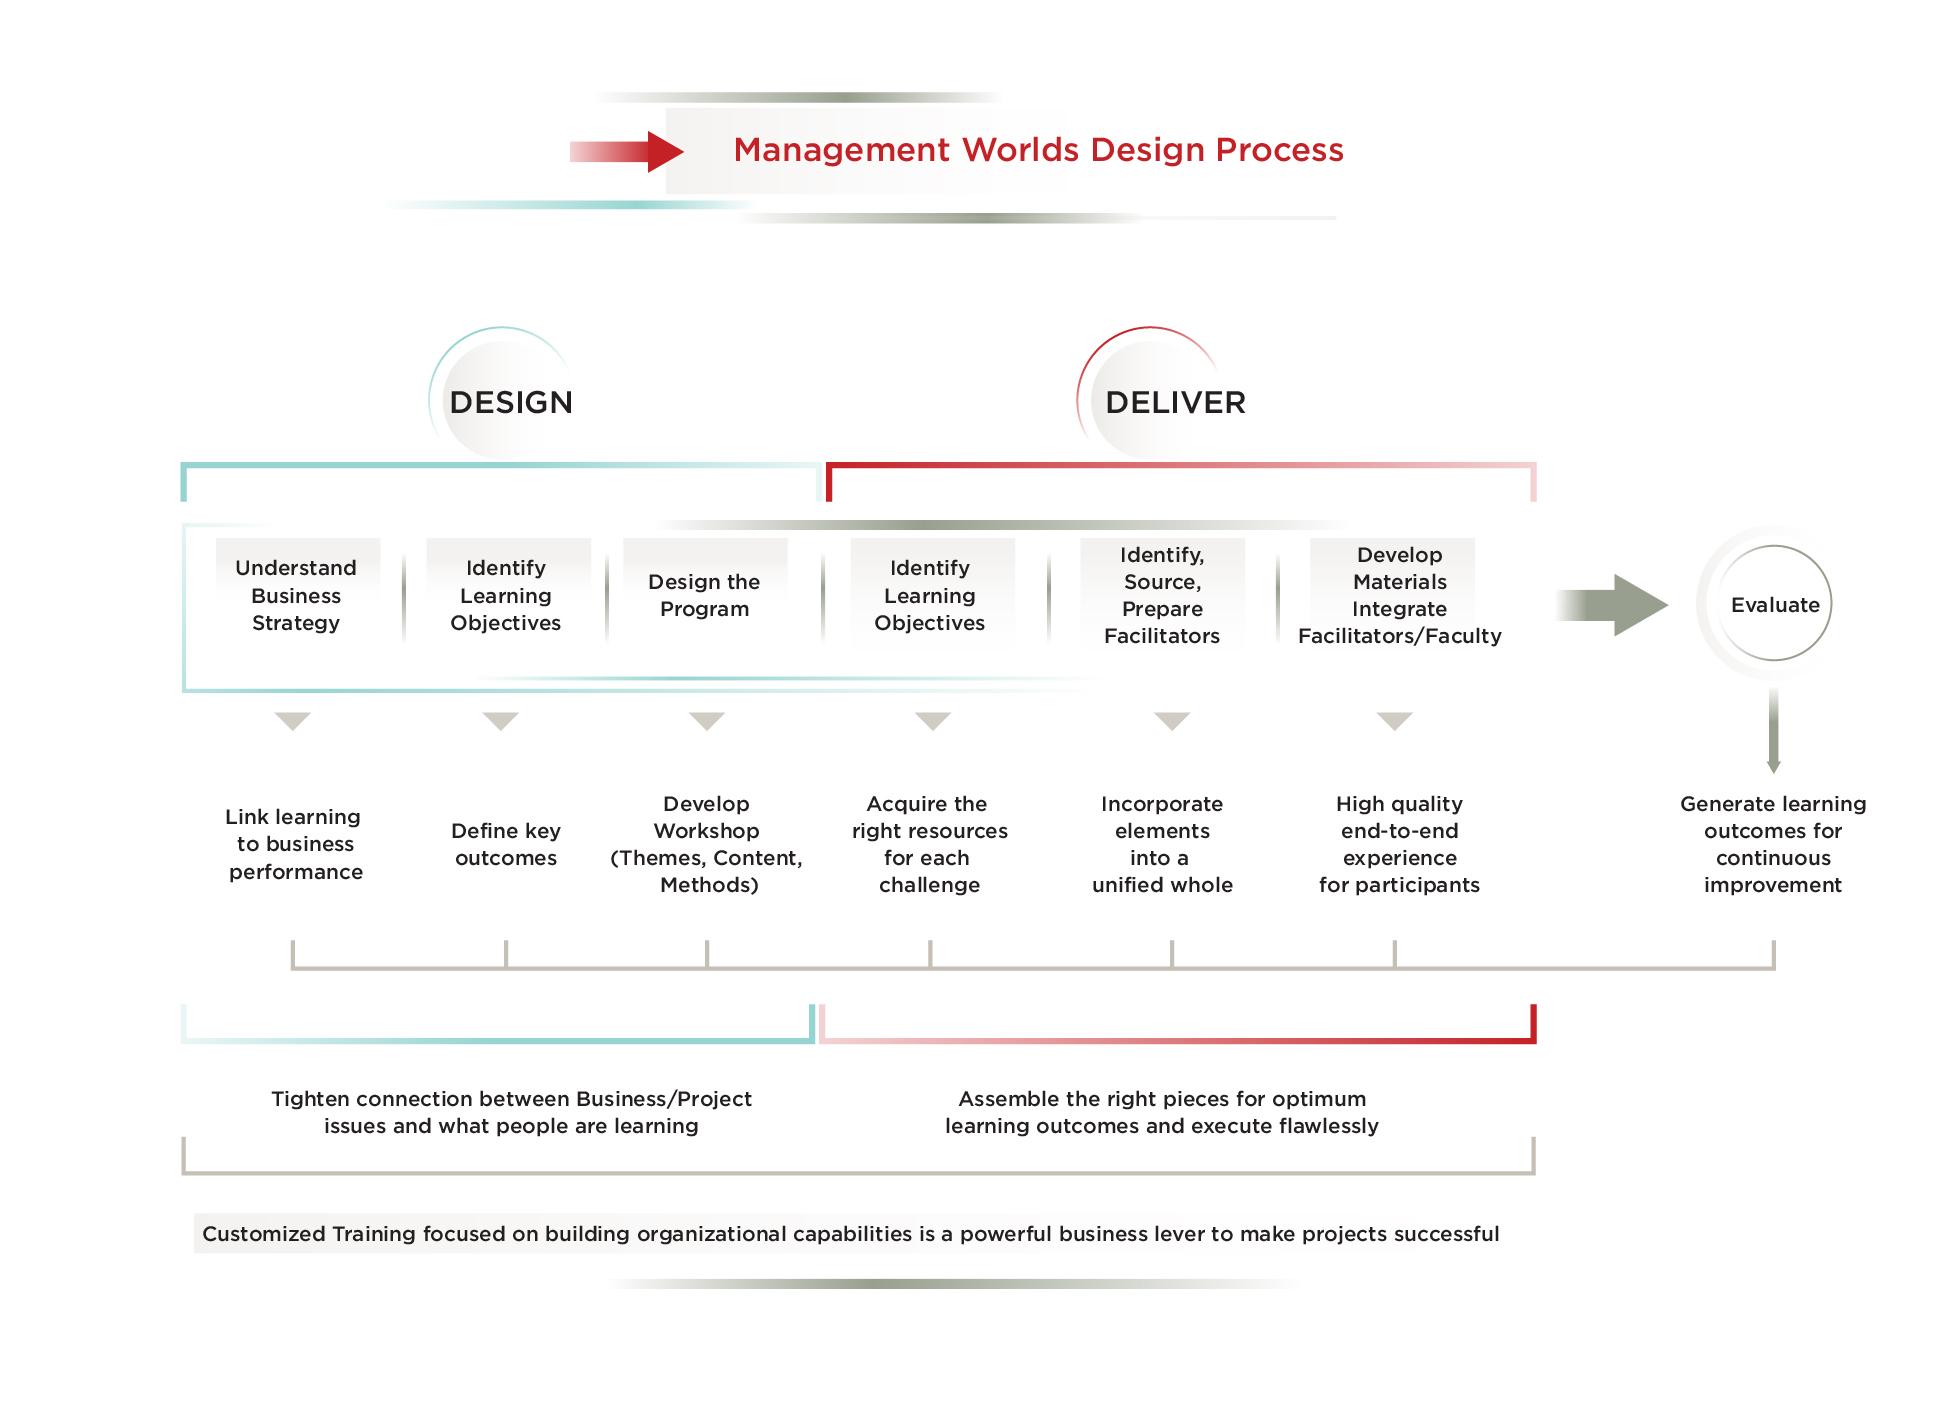 LC_ManagementDesign_v1.1-02 copy 2.jpg